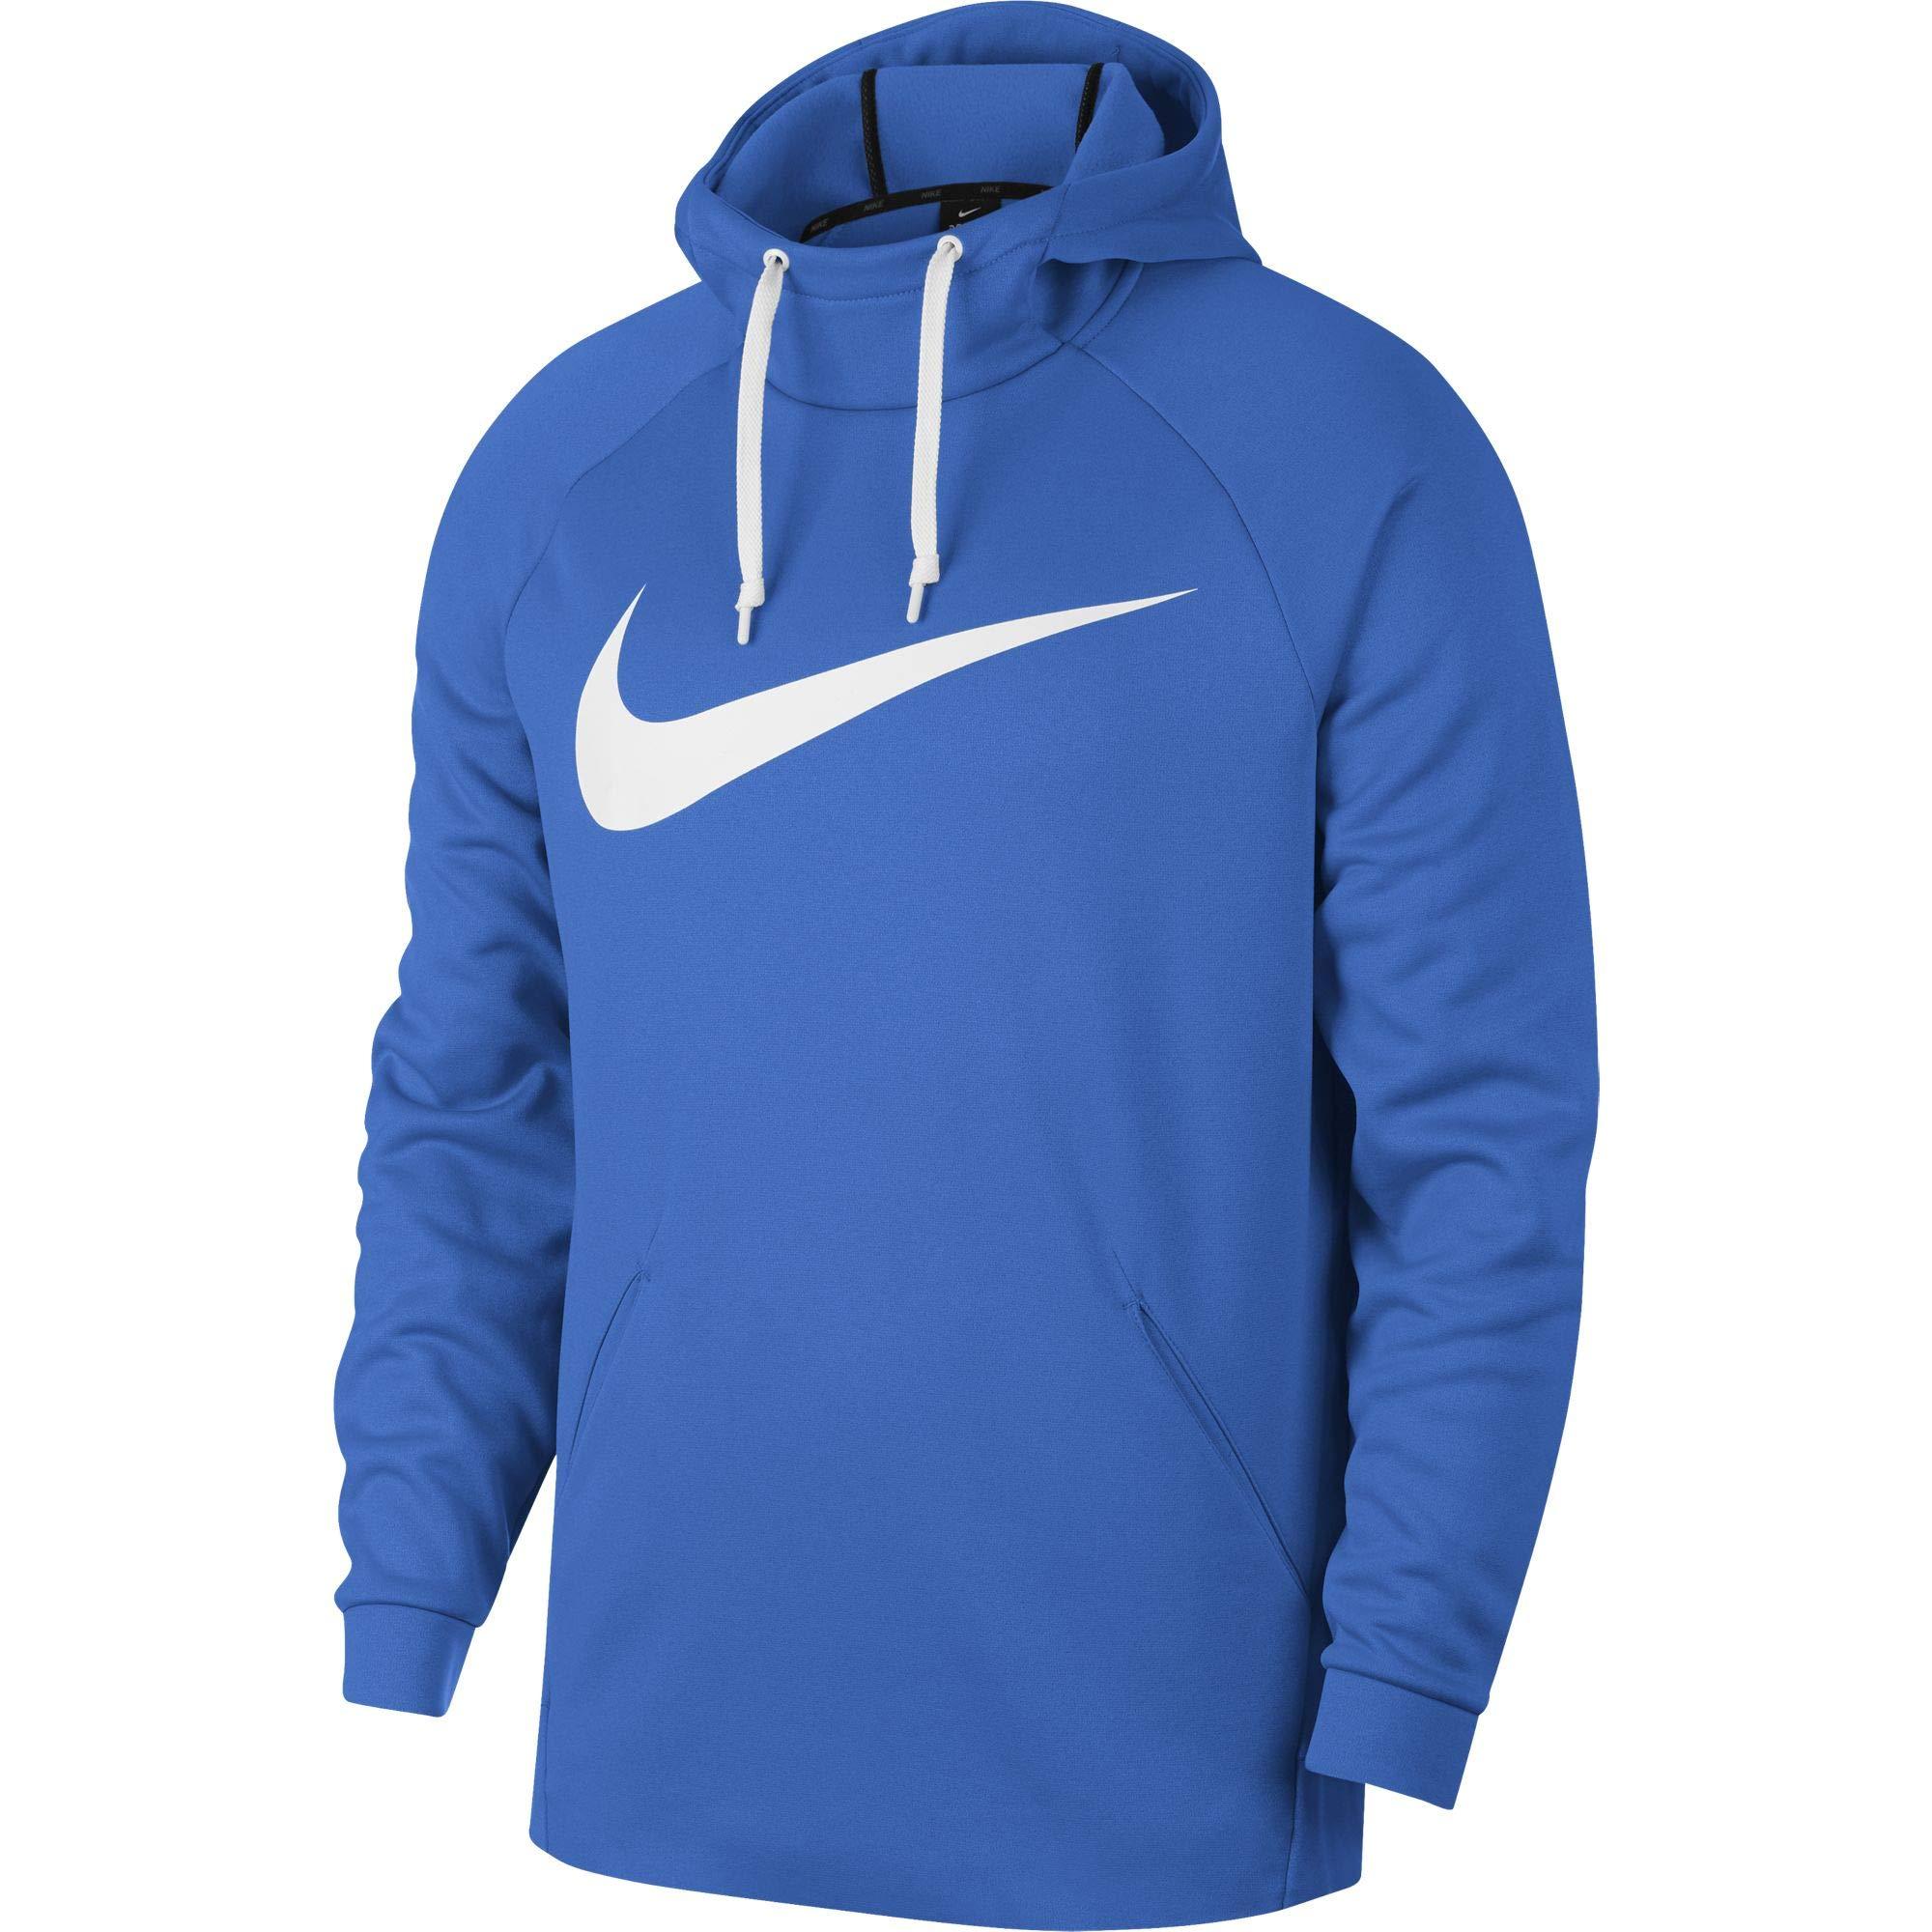 Nike Men's Therma Swoosh Training Hoodie Signal Blue/White Size Medium